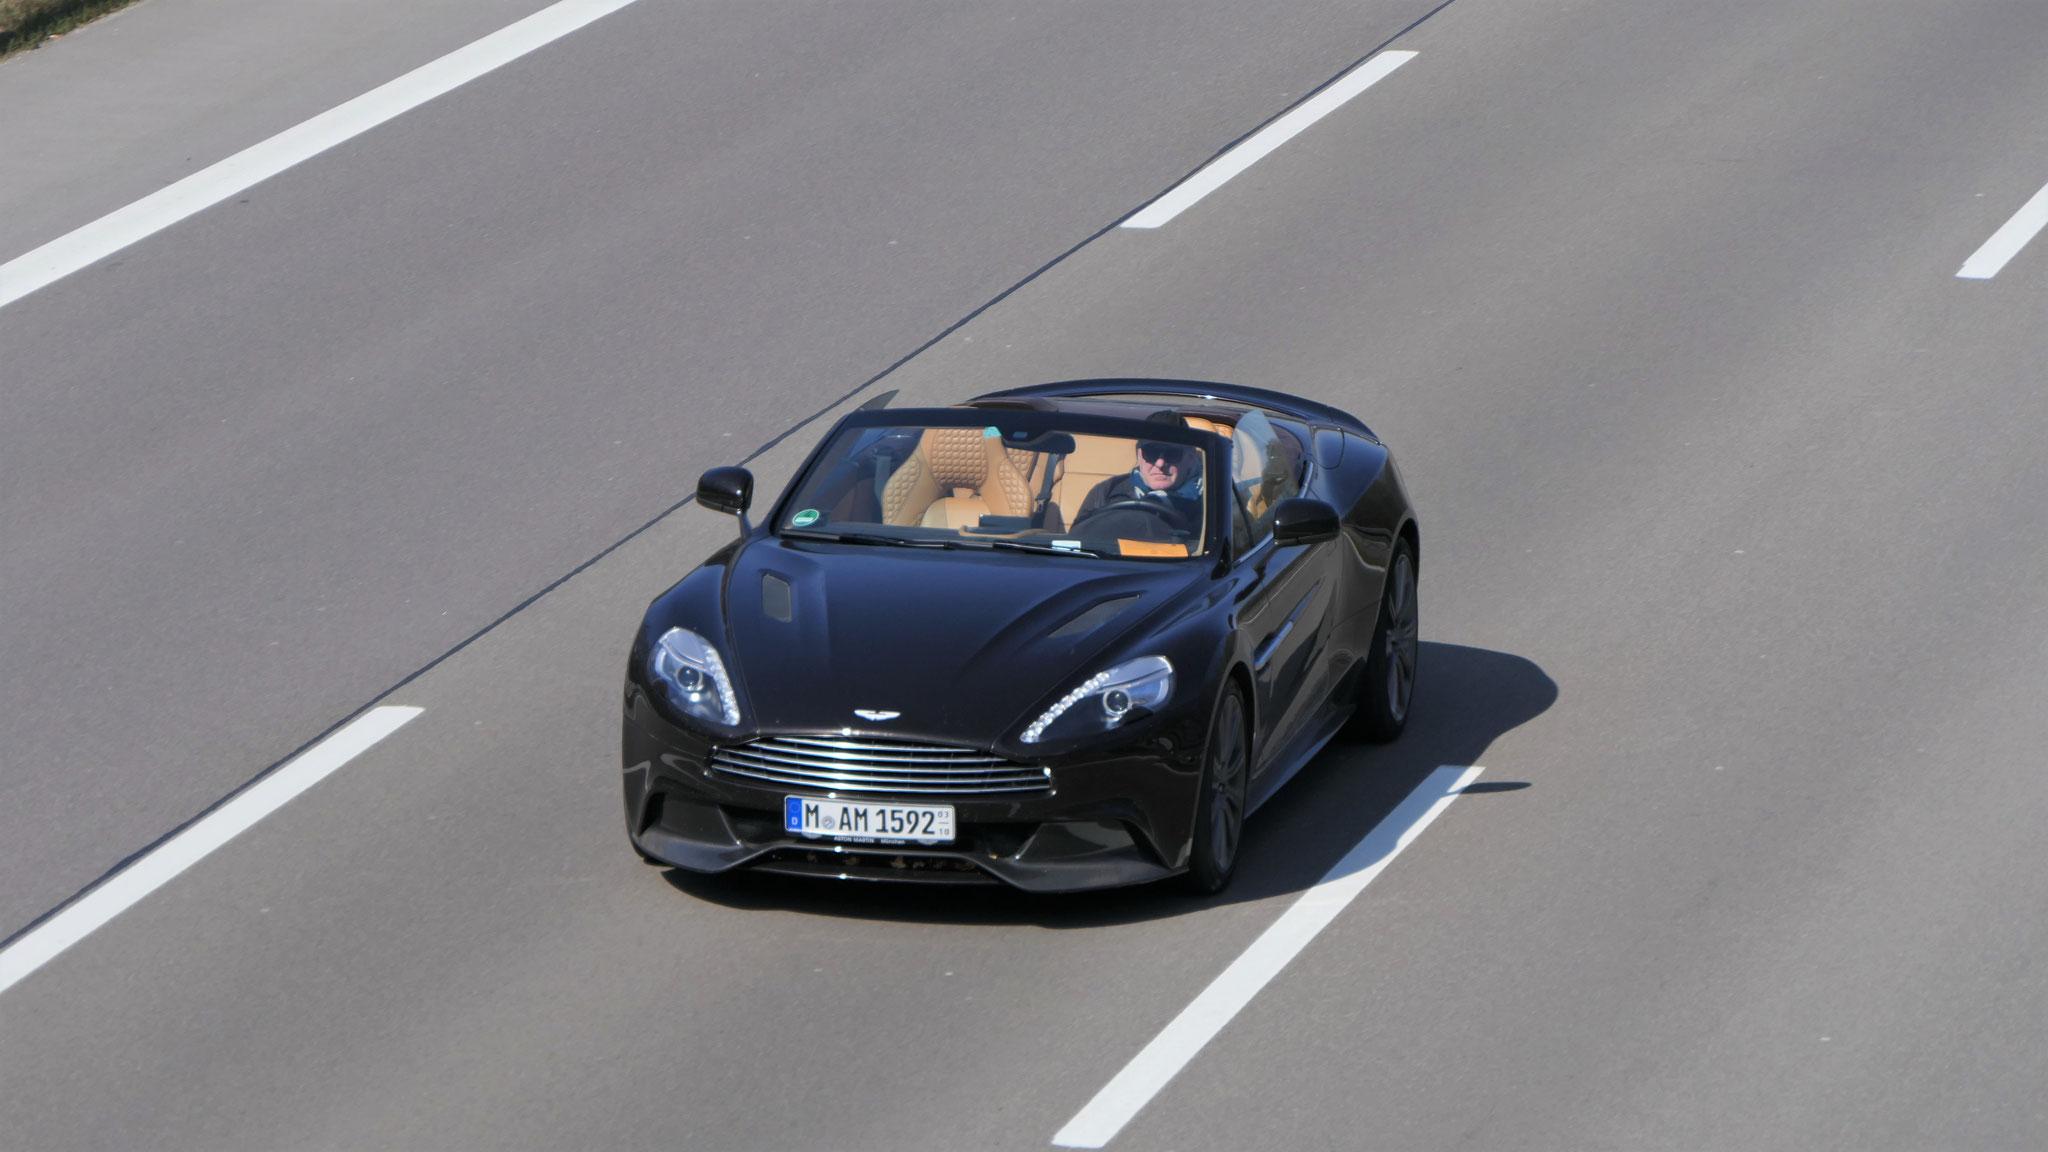 Aston Martin Vanquish - M-AM-1592